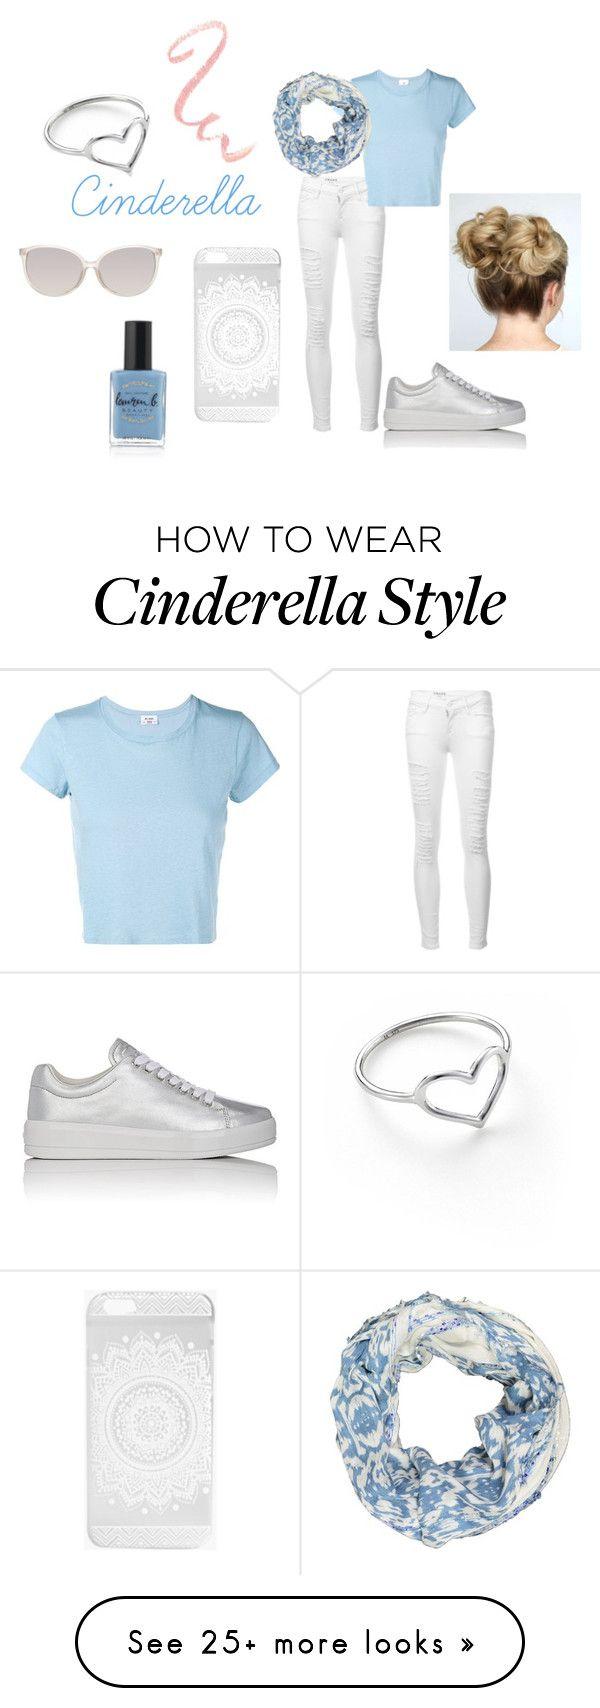 """Modern Cinderella"" by retrochic394 on Polyvore featuring Frame, RE/DONE, Prada Sport, Lauren B. Beauty, Linda Farrow, LA77, Boohoo, Jordan Askill, modern and ModernPrincessesByMolly"